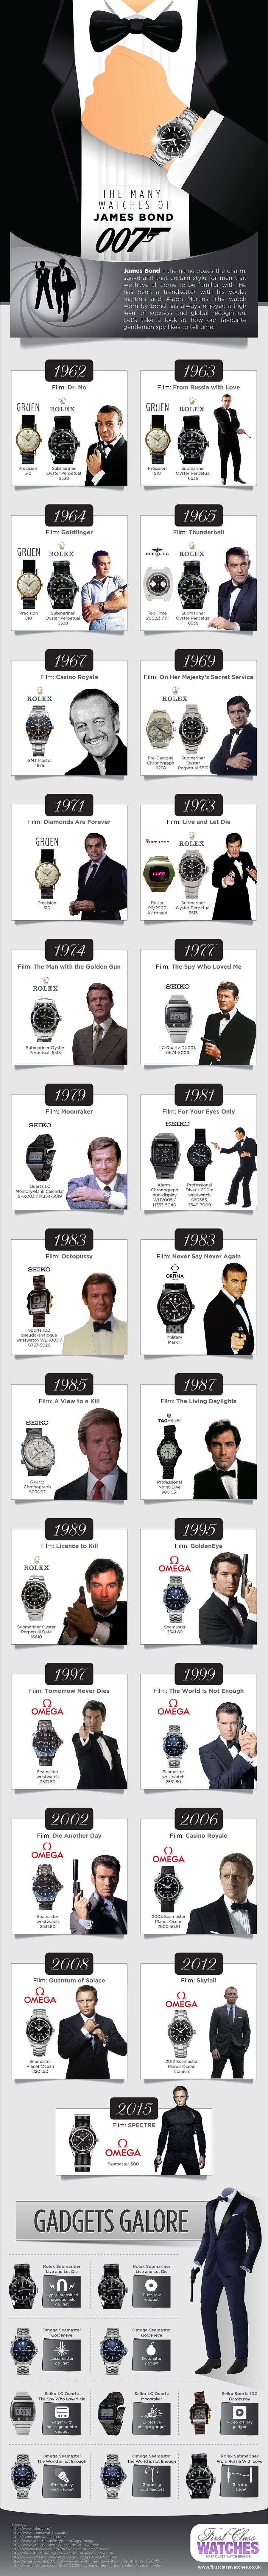 Hodinky Jamese Bonda